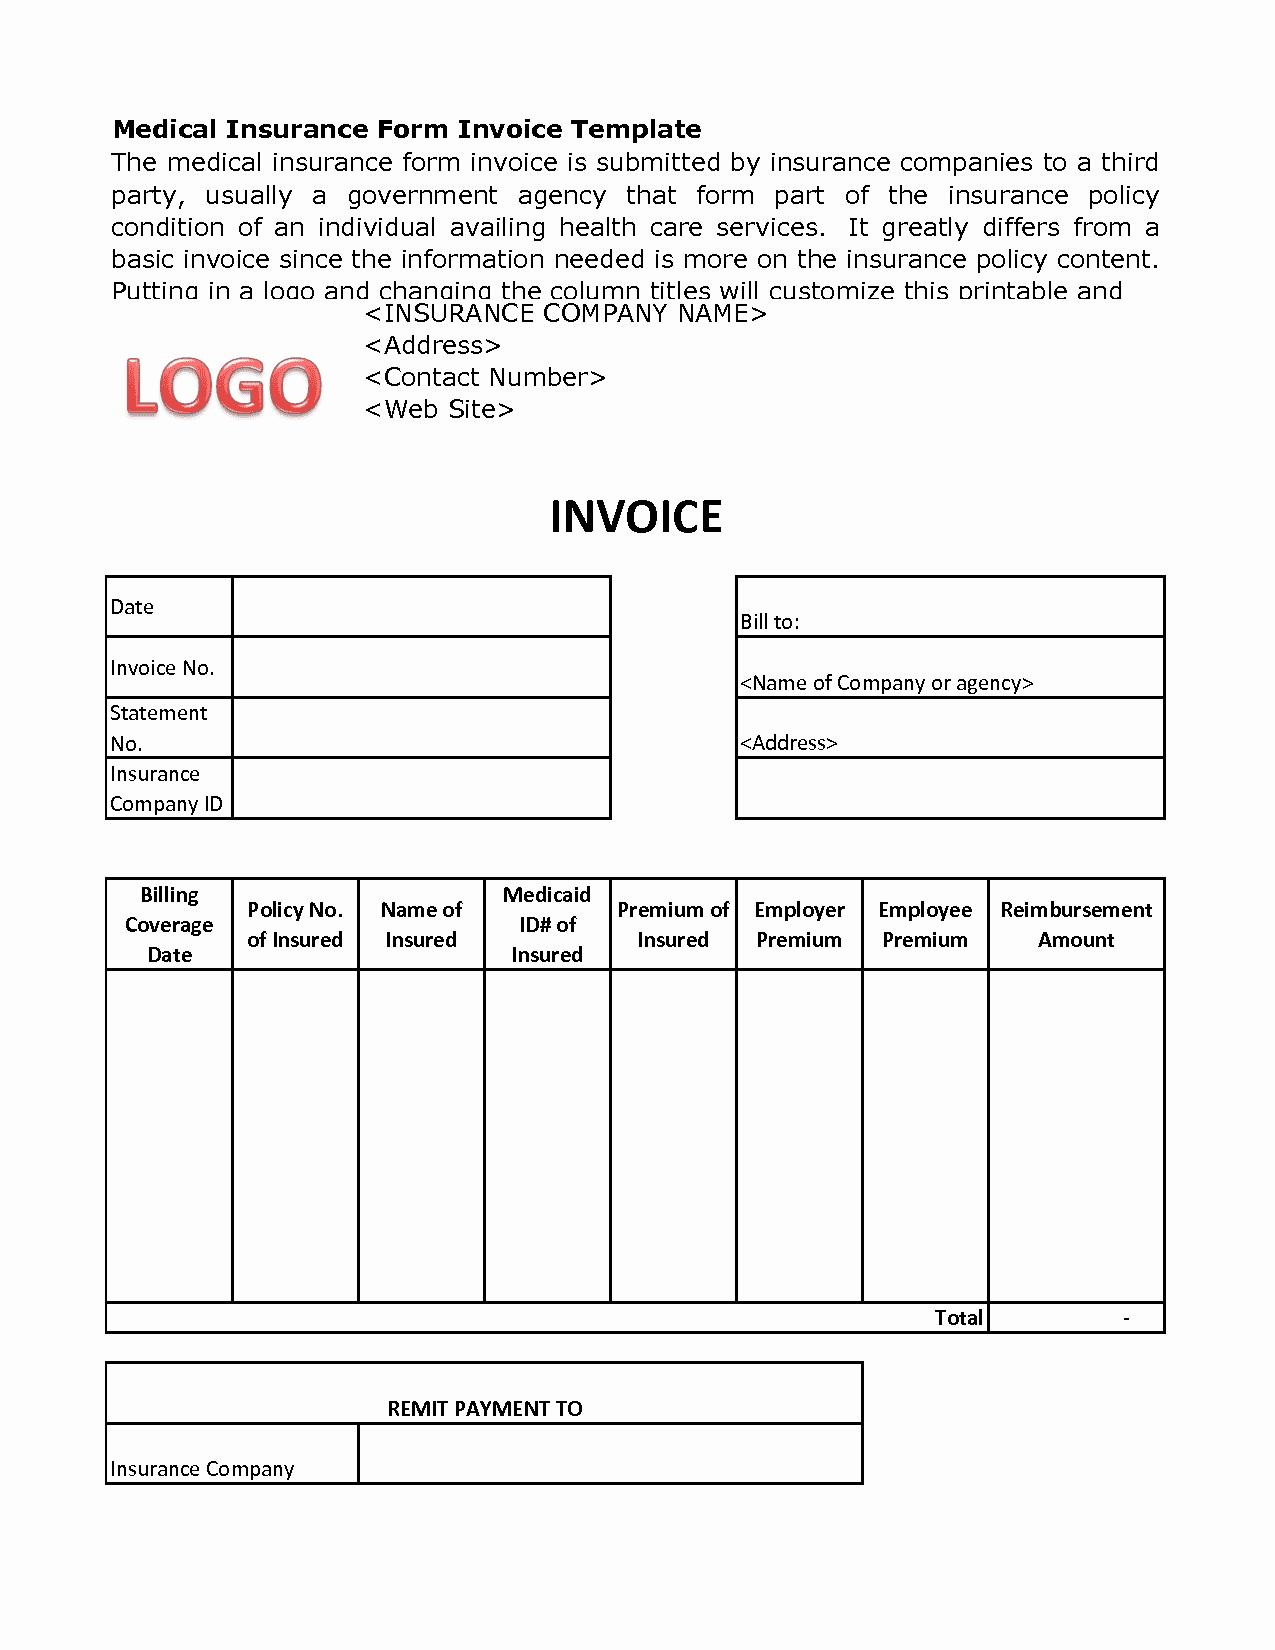 Medical Billing Invoice Template Beautiful Medical Billing Invoice Template Free Excelxo